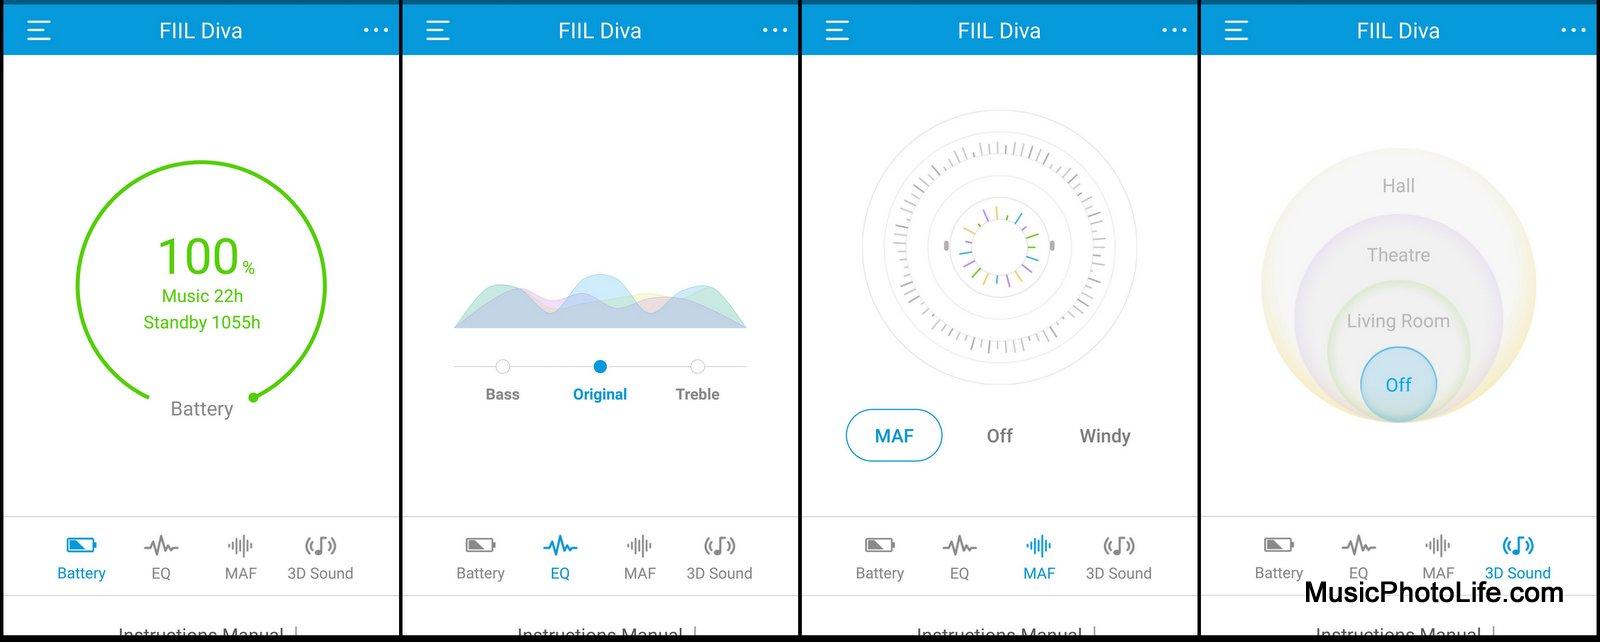 FIIL+ app review by musicphotolife.com